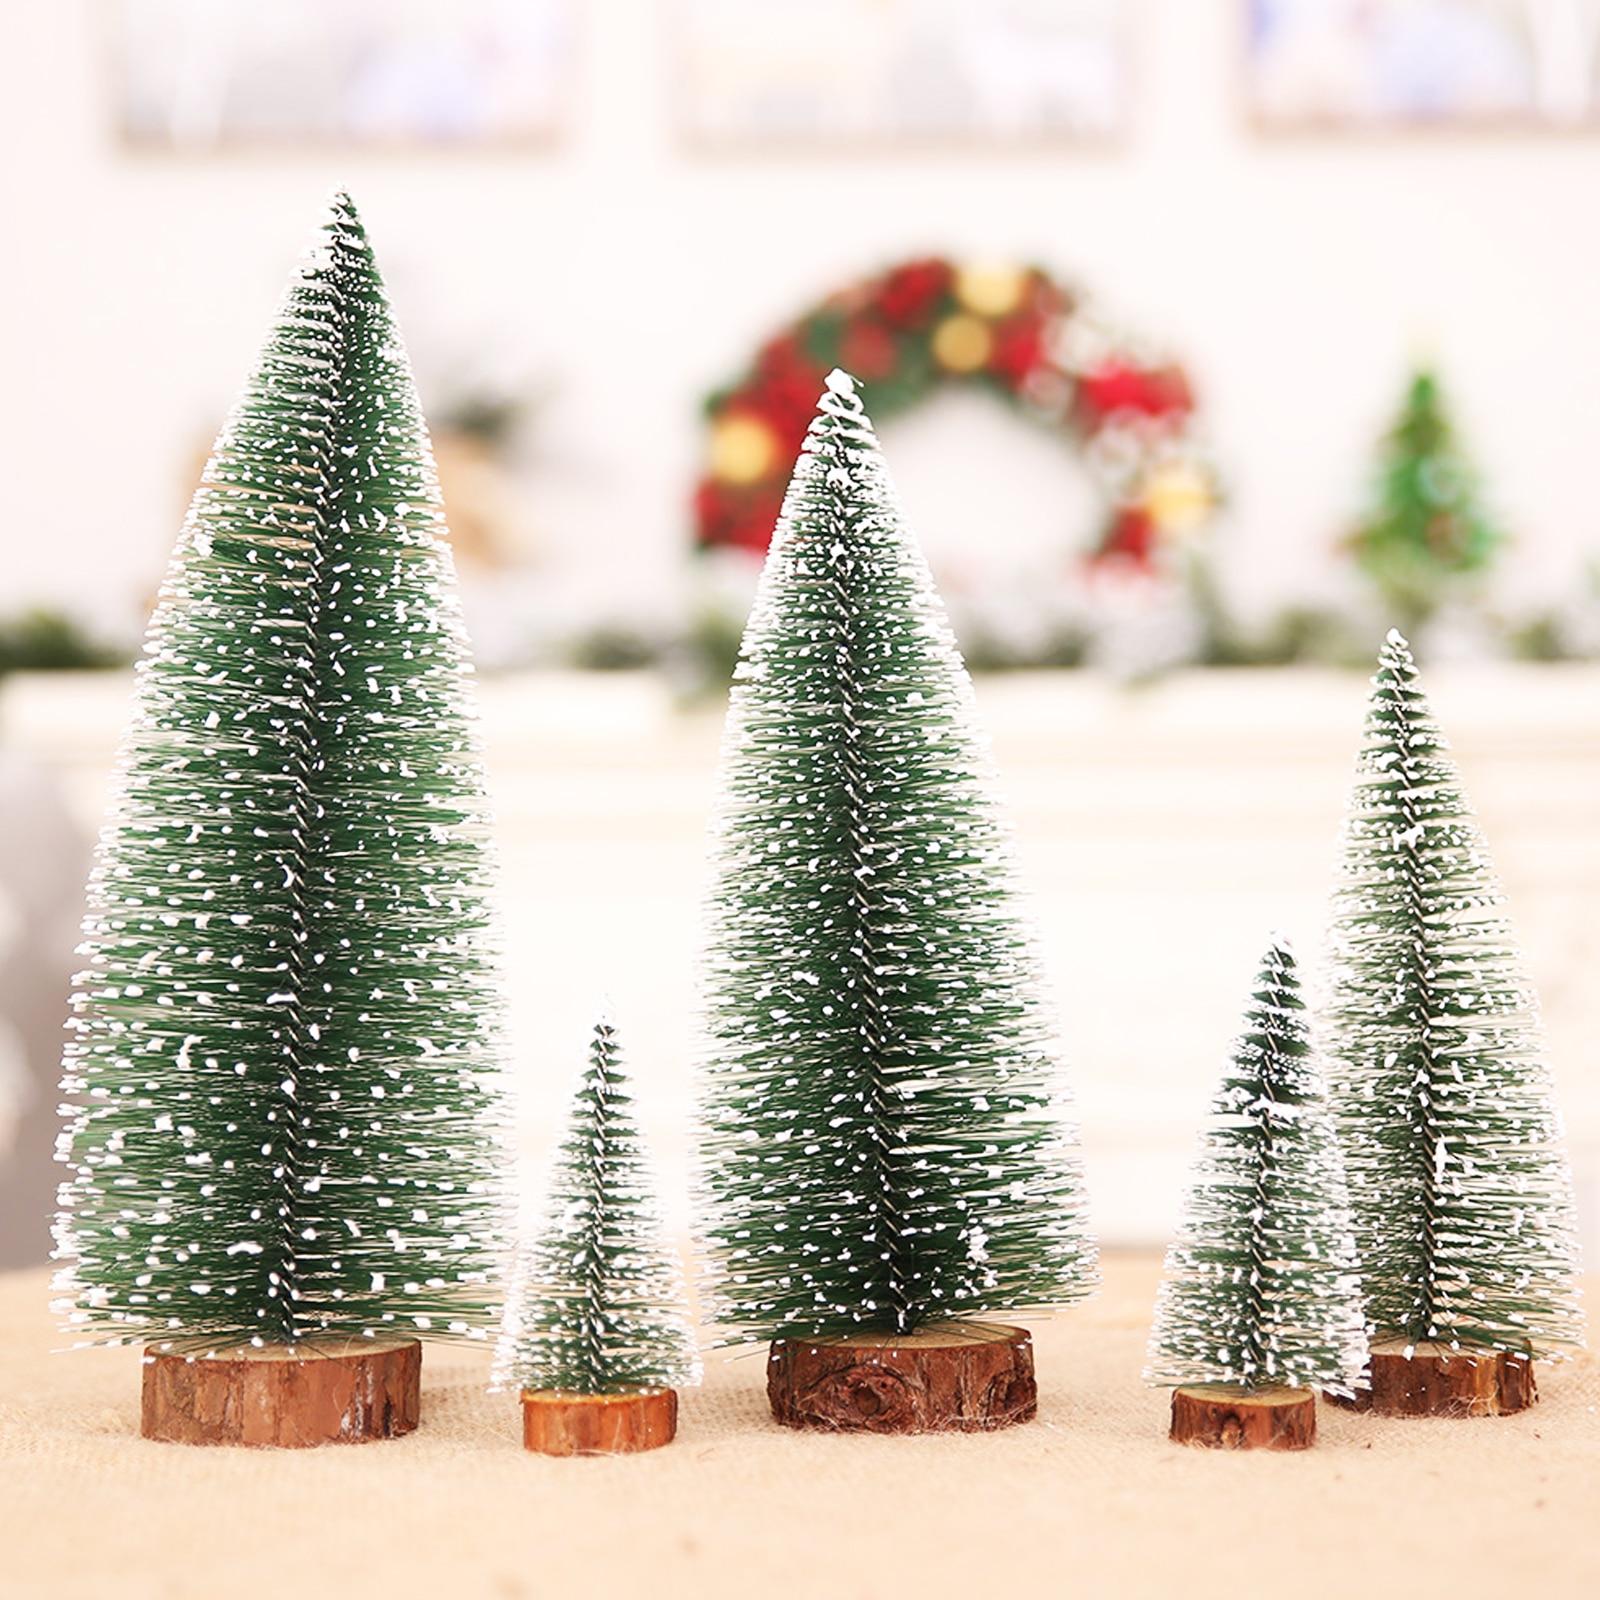 10cm,15cm,20cm,25cm,30cm Mini Snow Pine Needle Tree Bauble Crafts Noel Tree Ornaments Wooden Christmas Decorations for Home